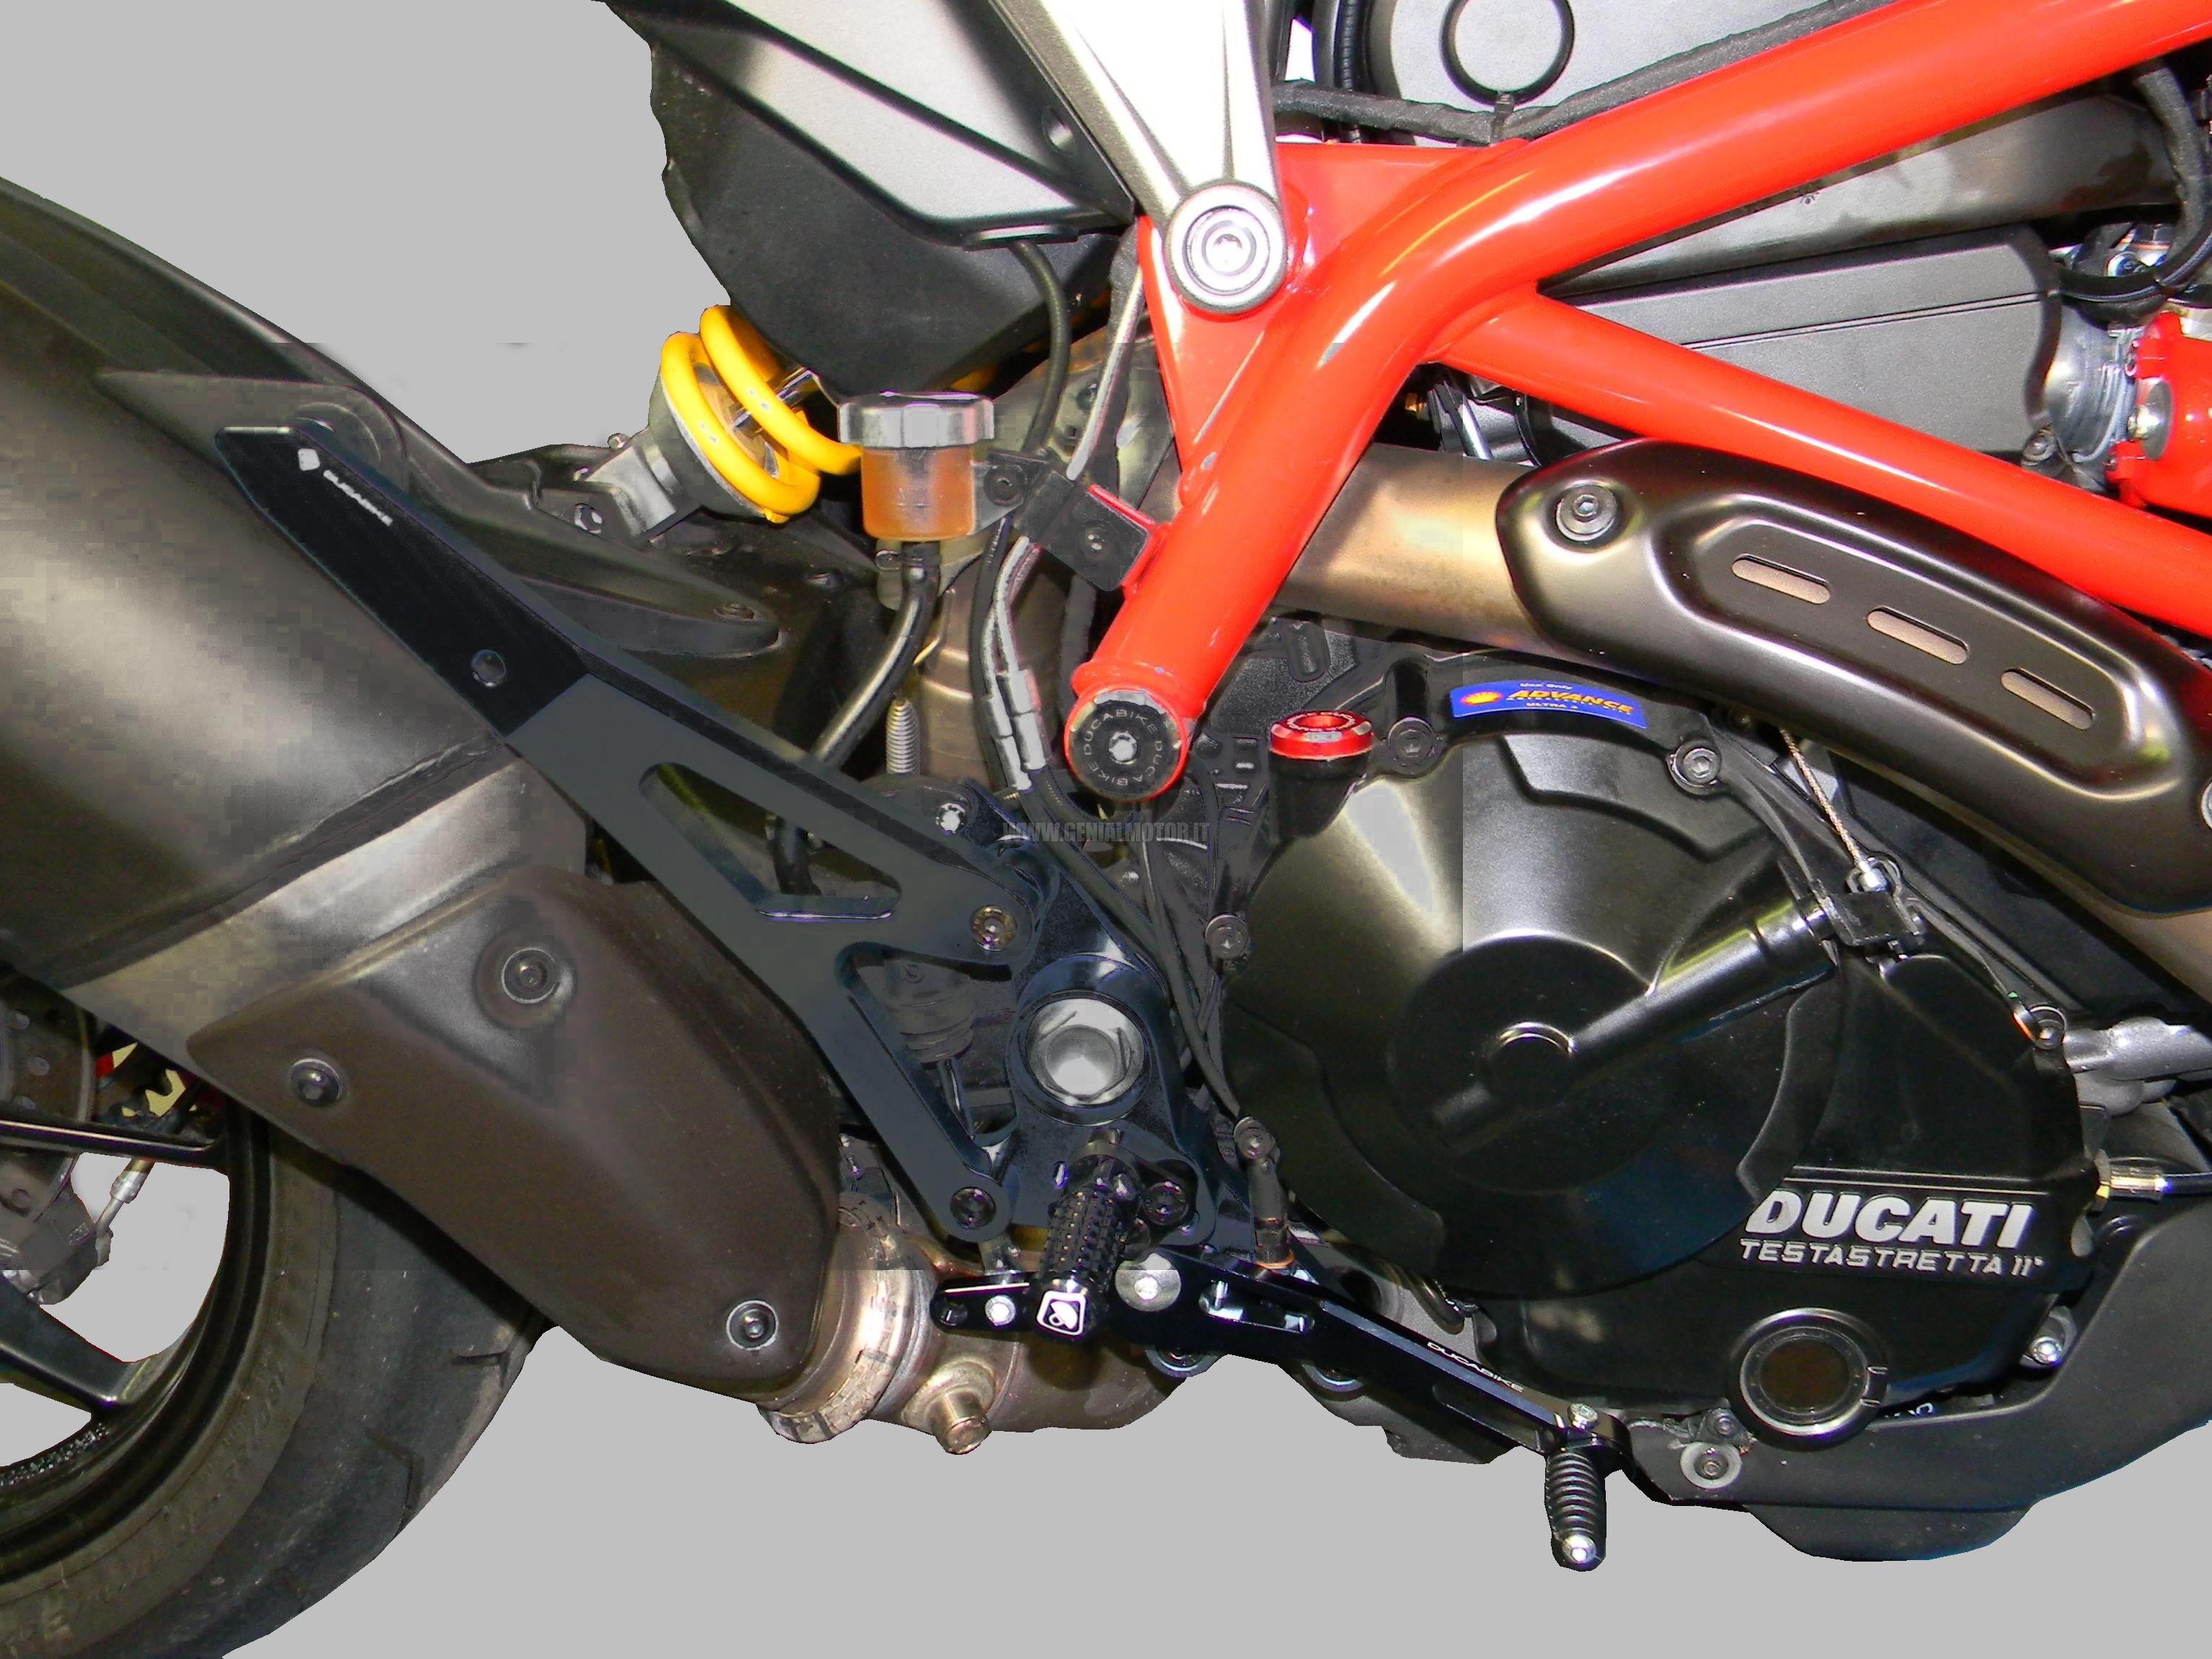 PRNHME01DD Ducabike Prnhme01dd Pedane Hypermotard 821 Nero